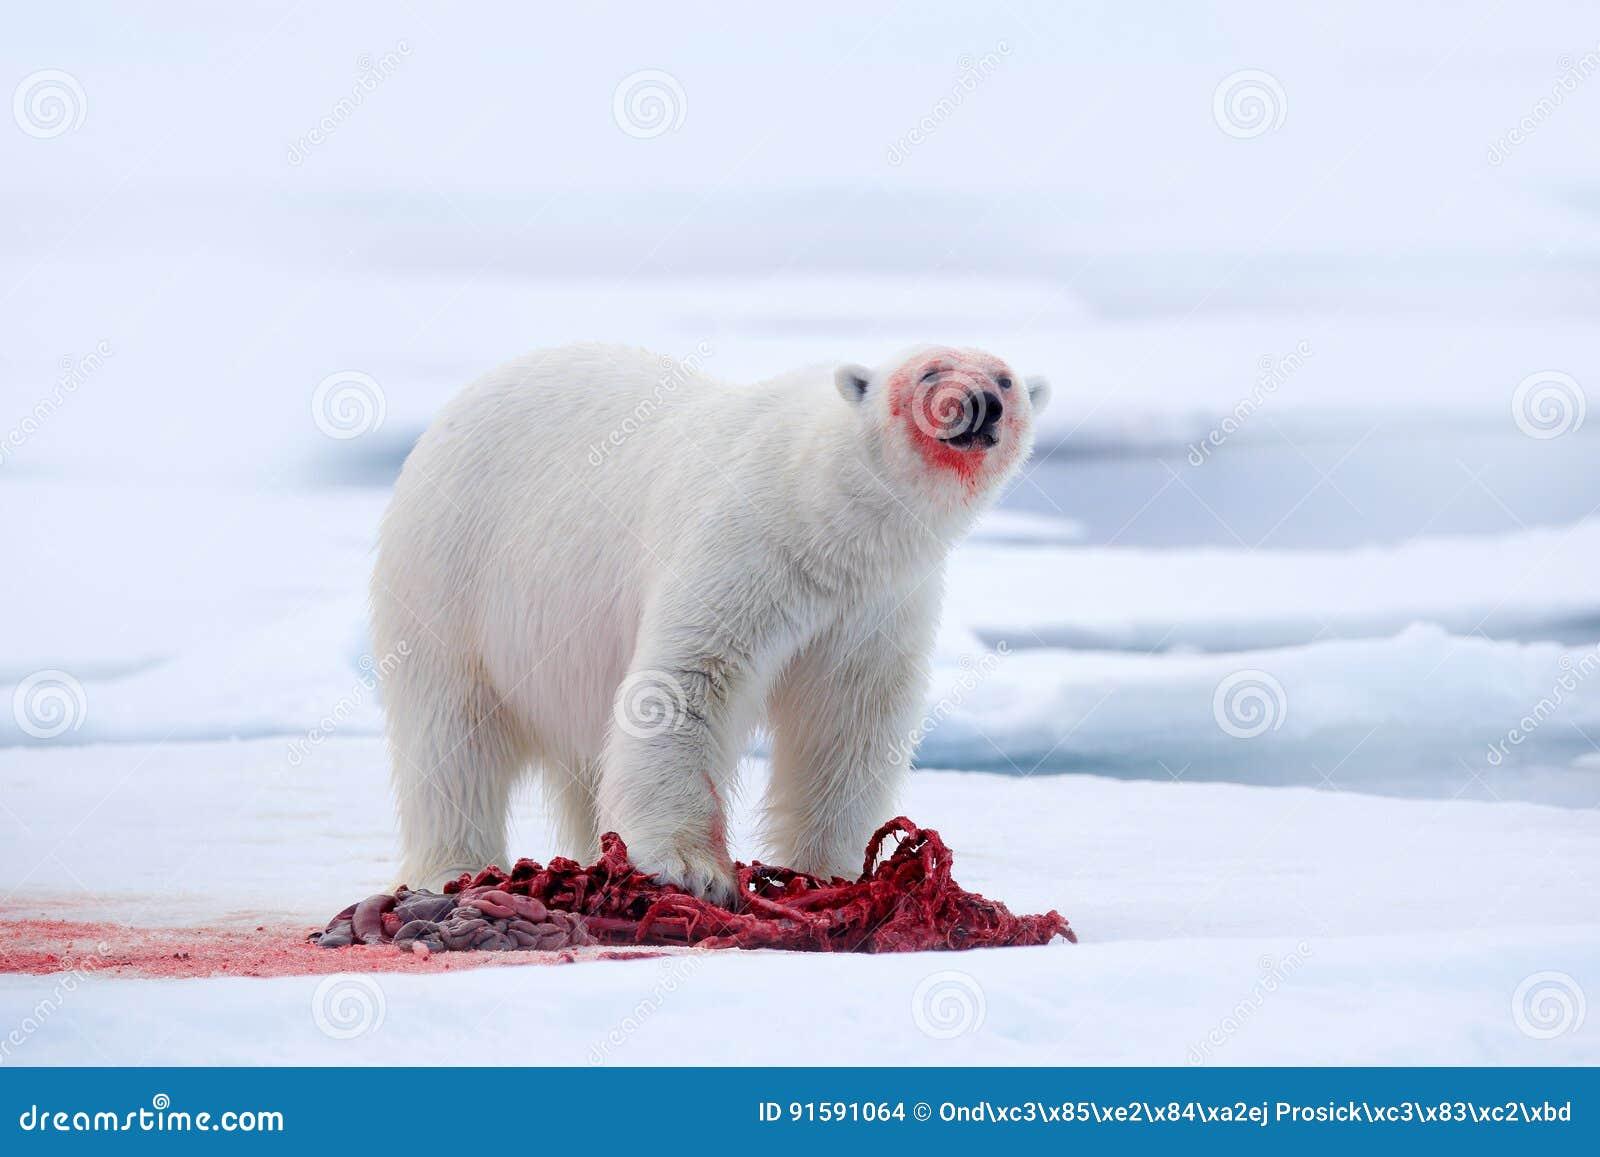 White polar bear on drift ice with snow feeding kill seal, skeleton and blood, Svalbard, Norway. Bloody nature, big animal. Polar